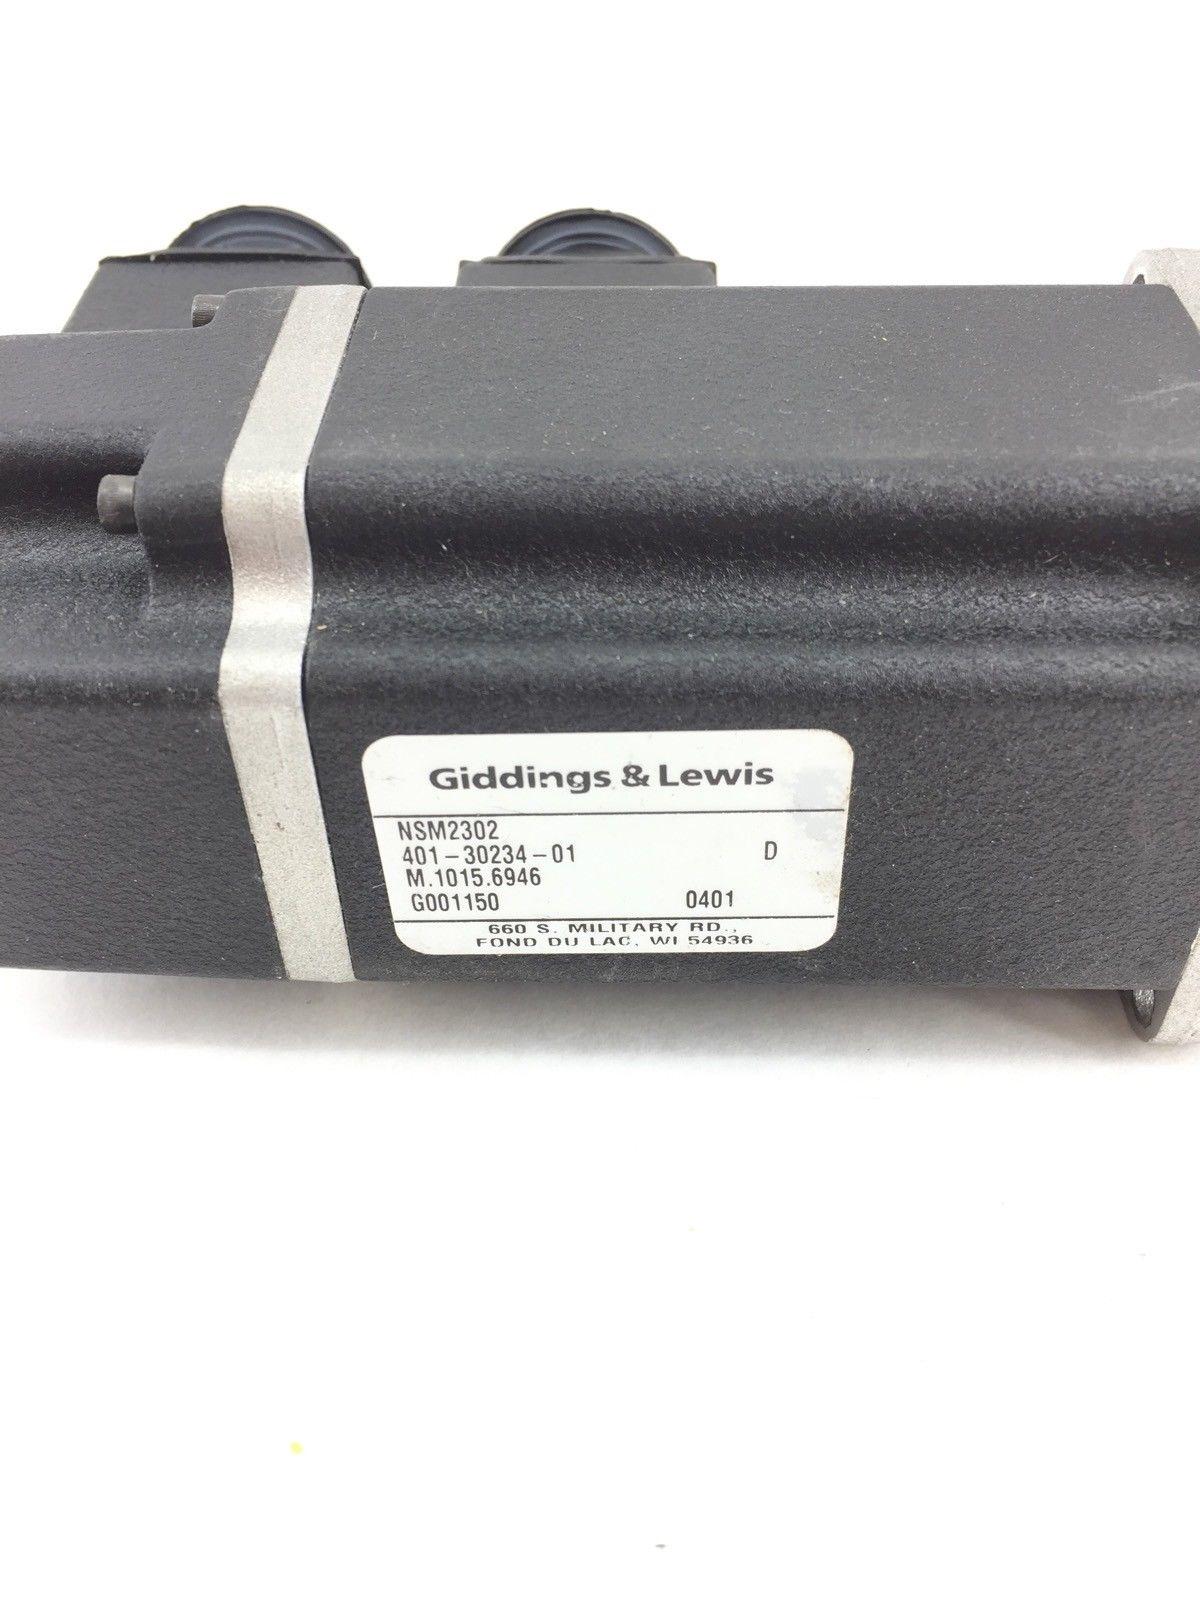 GIDDINGS AND LEWIS MOTOR NSM2302 401-30234-01 (A588) 2